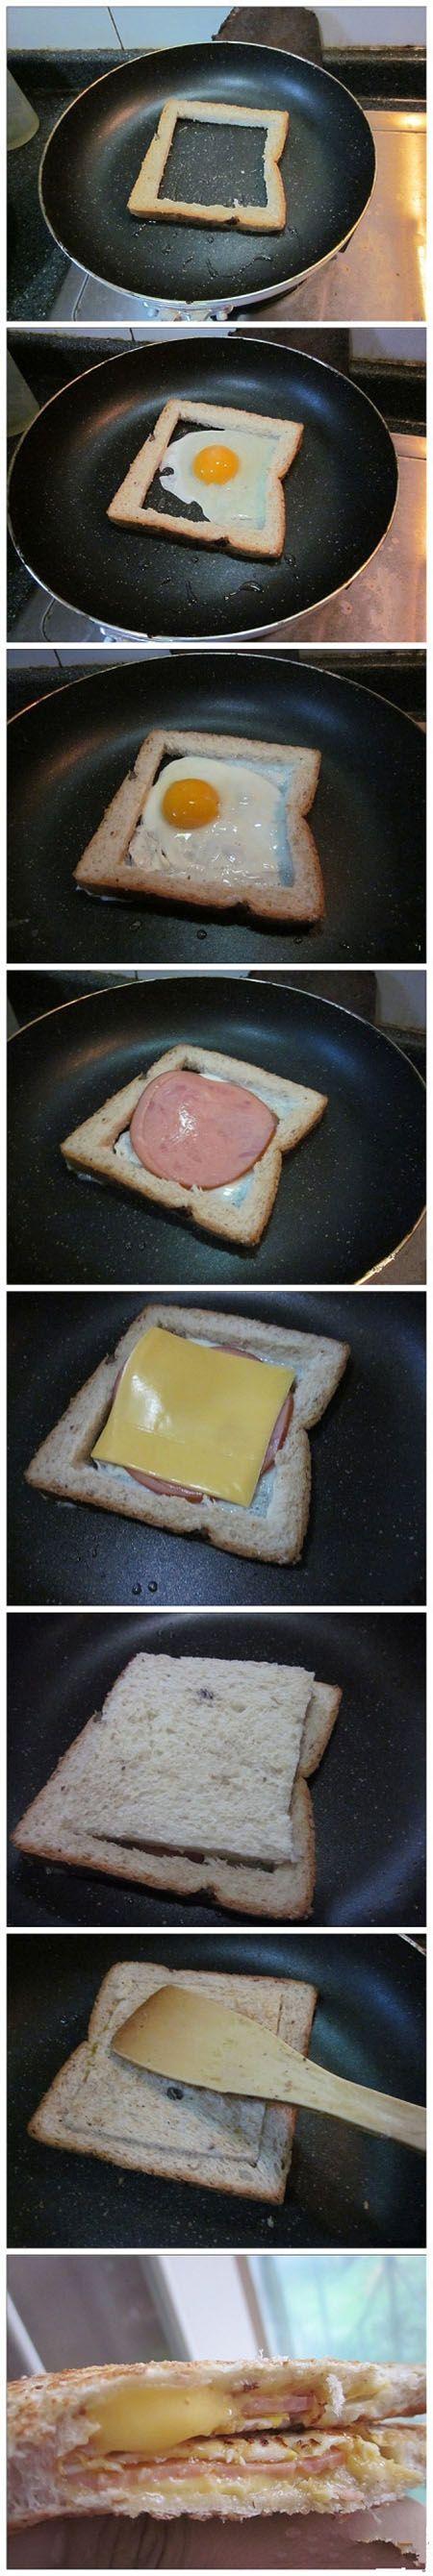 Oh boy! I'm making this for breakfast tomorrow! Great Bread Idea   DIY & Crafts